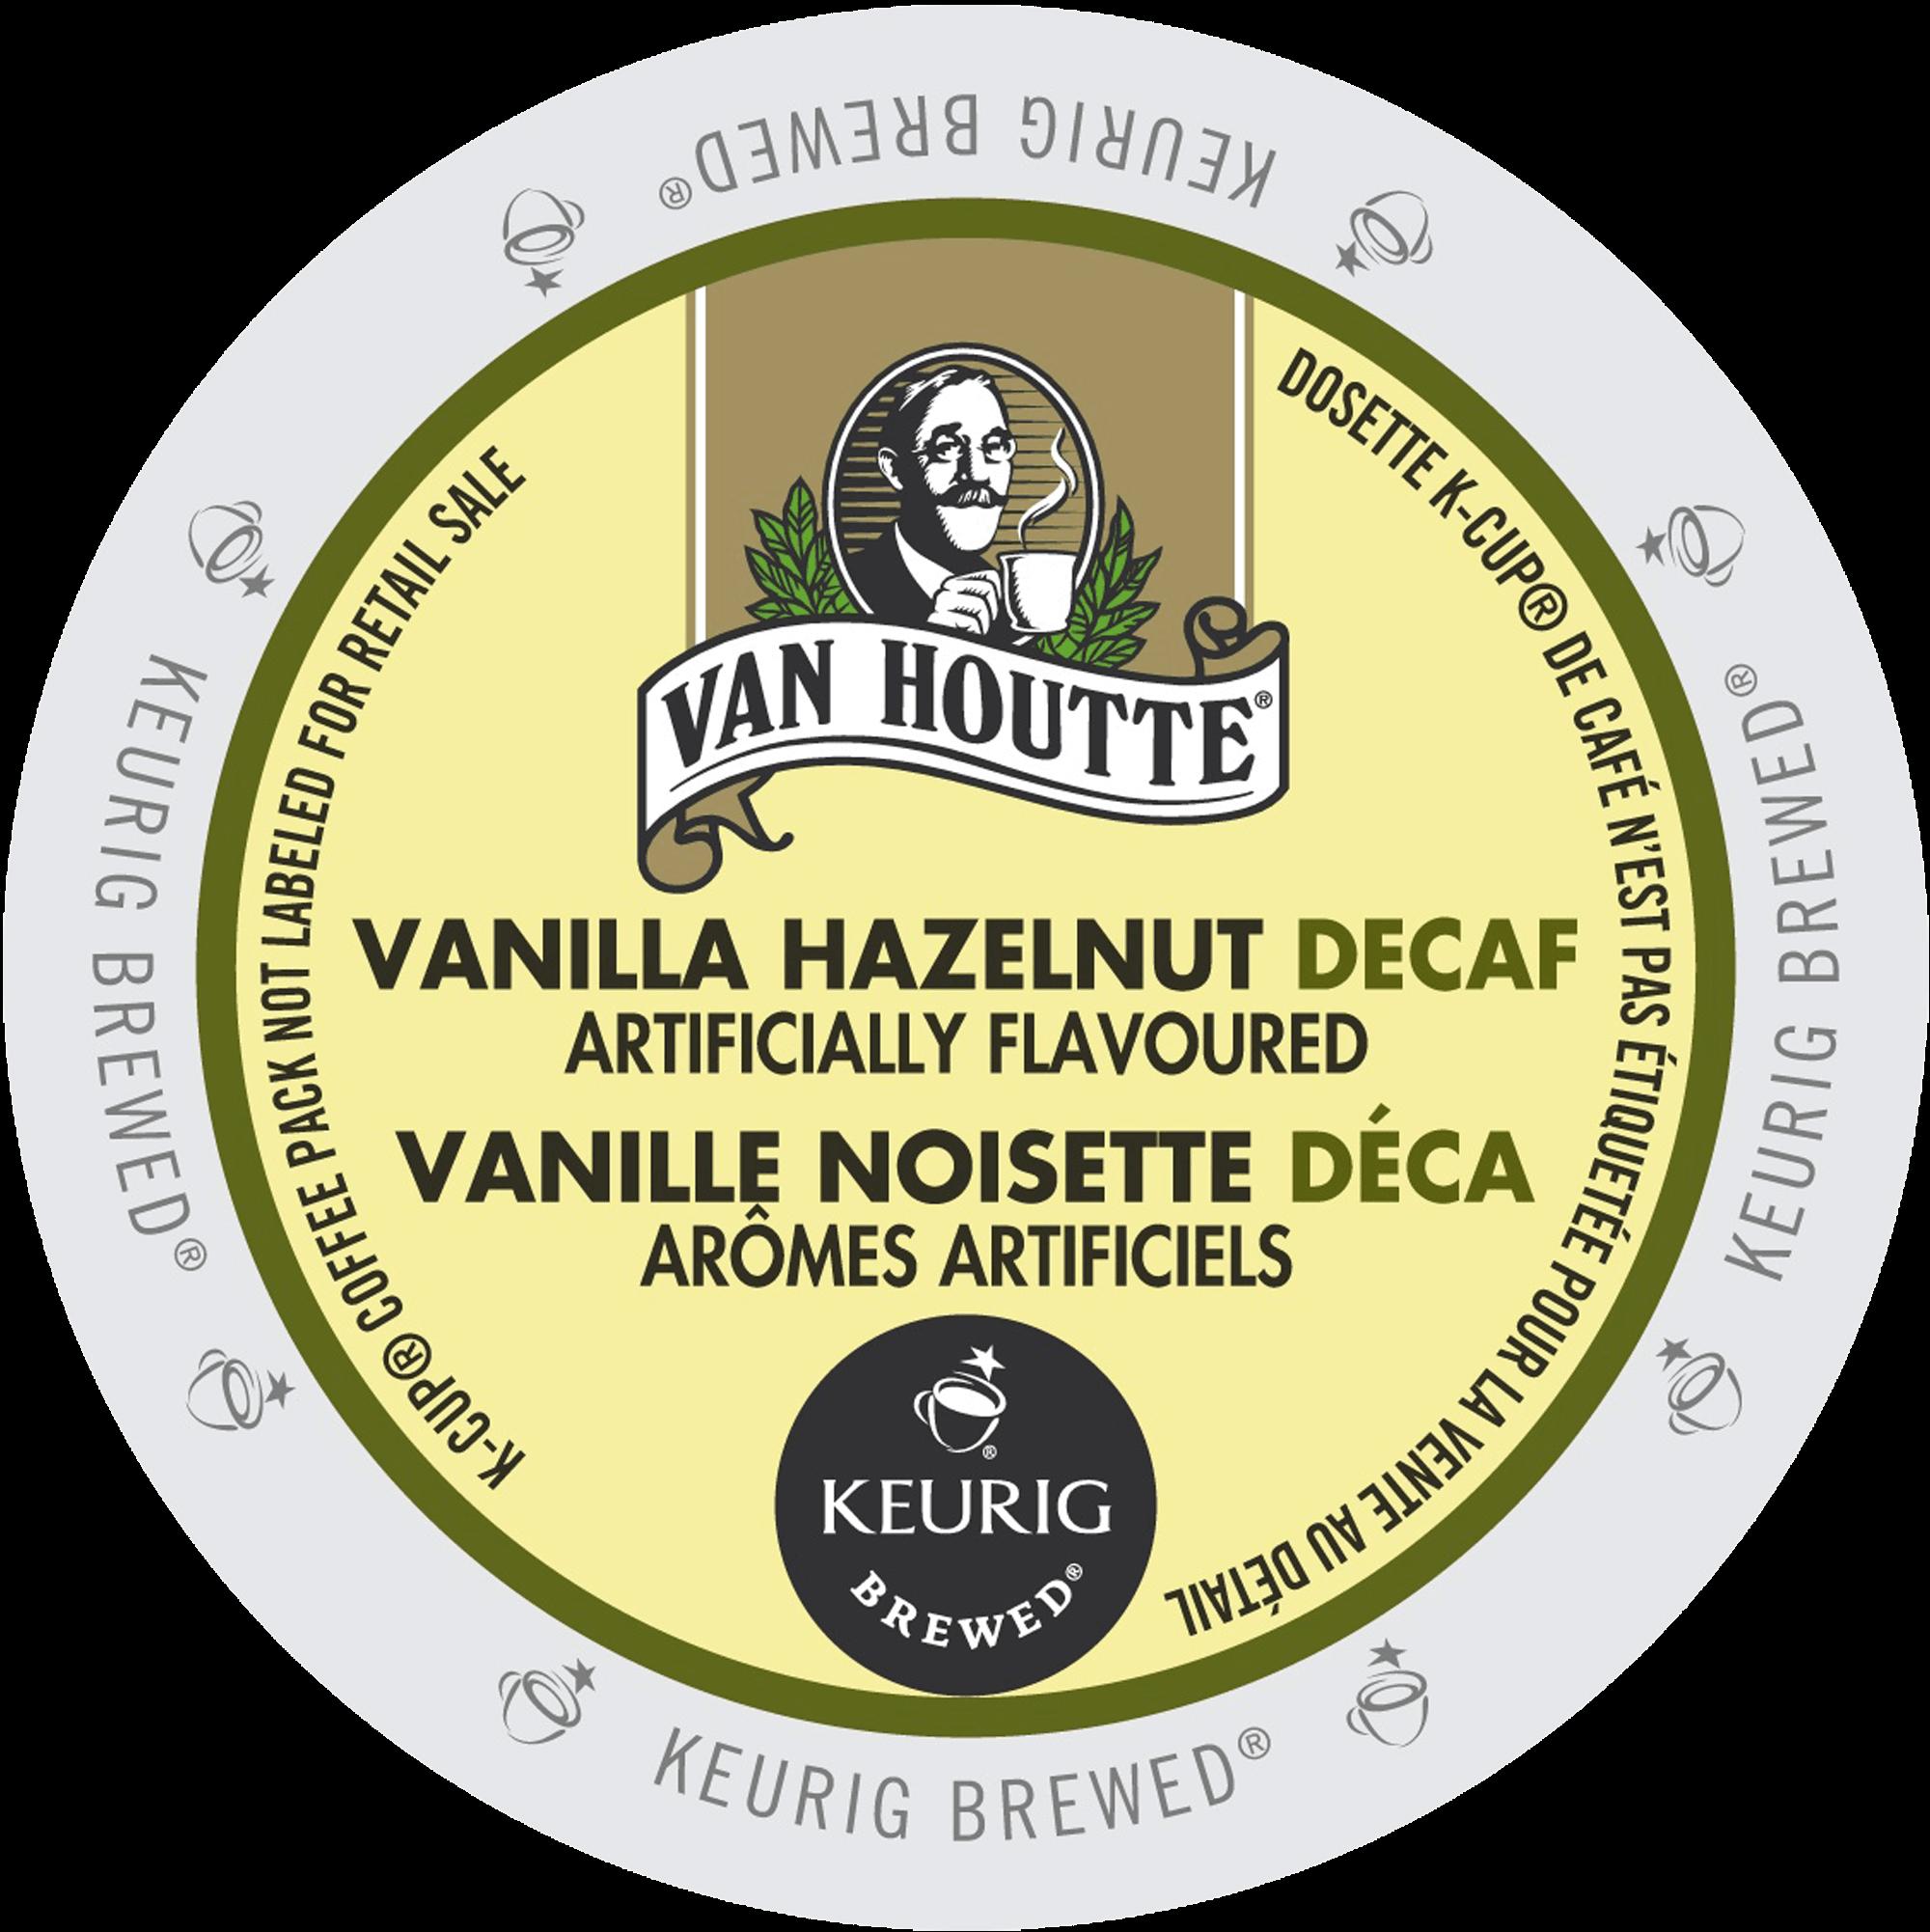 vanilla-hazelnut-decaf-coffee-van-houtte-k-cup_ca_general